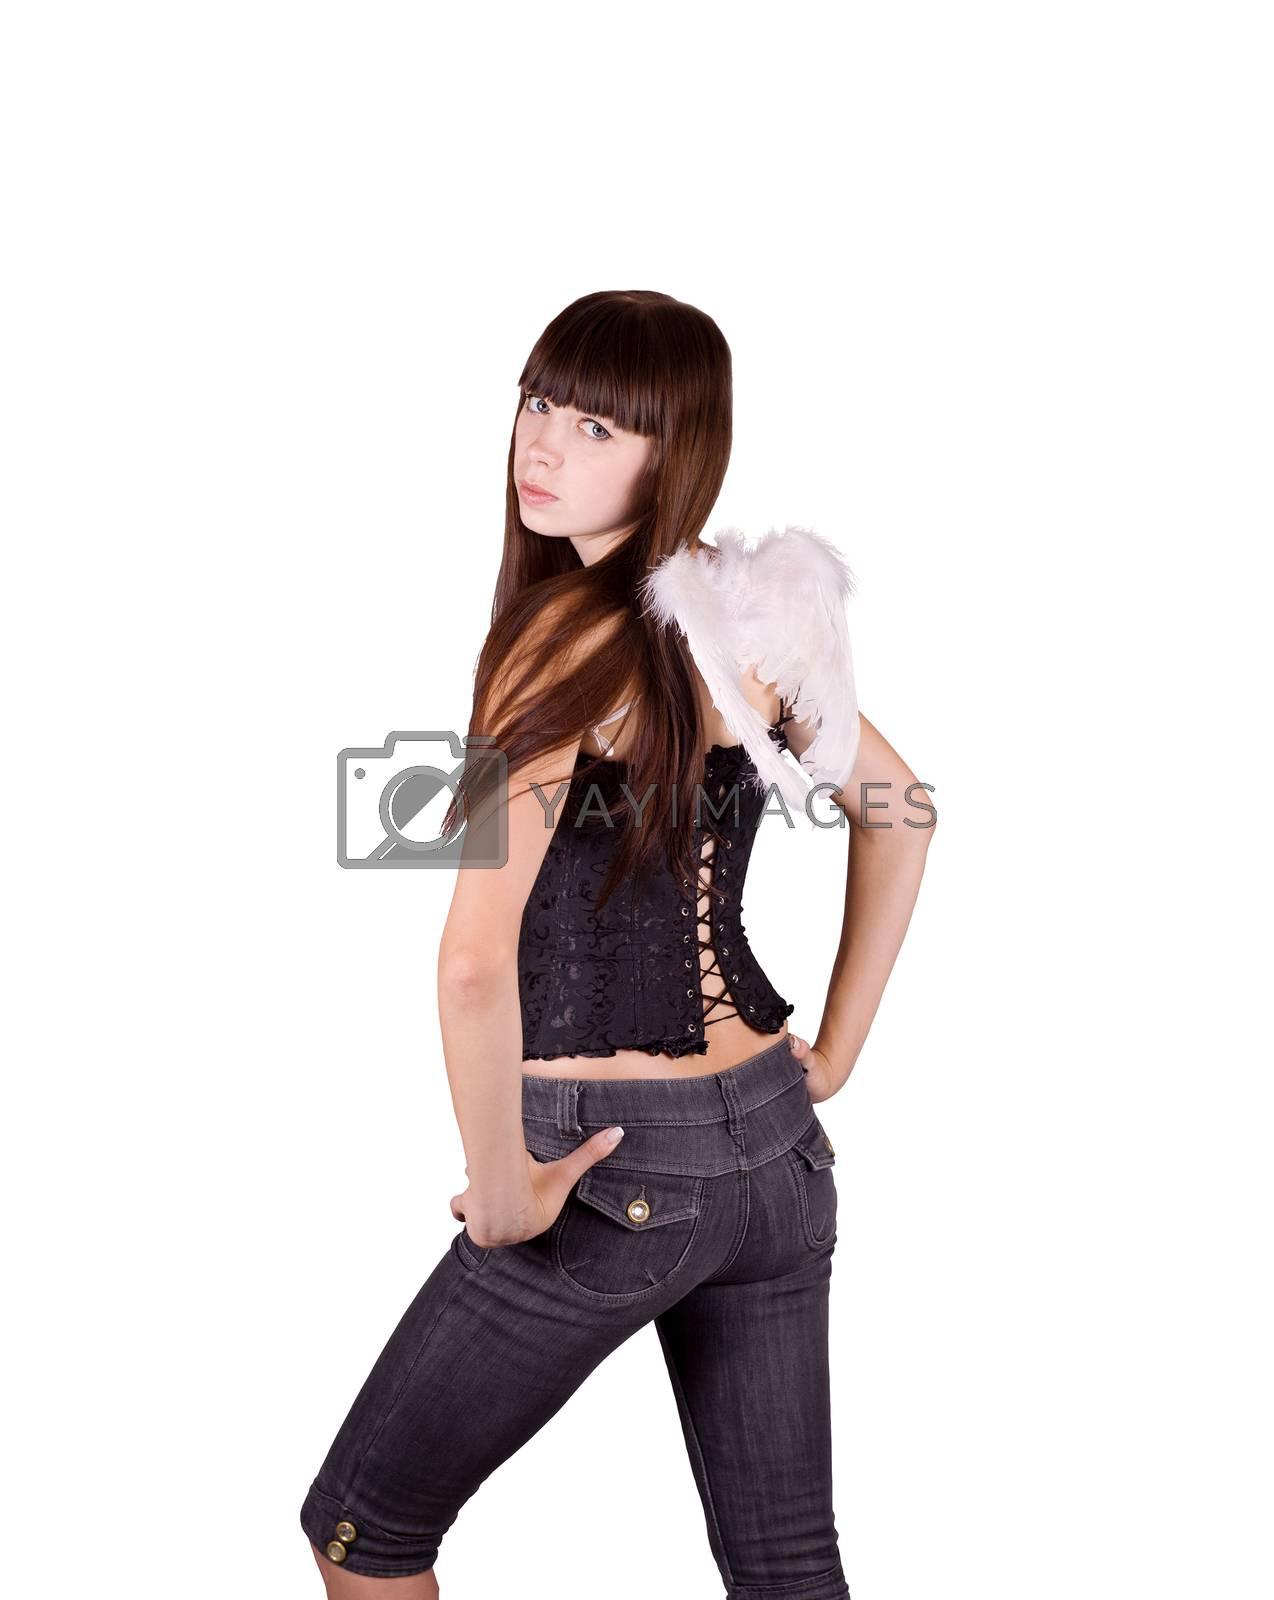 Royalty free image of Girl-angel by Krakatuk